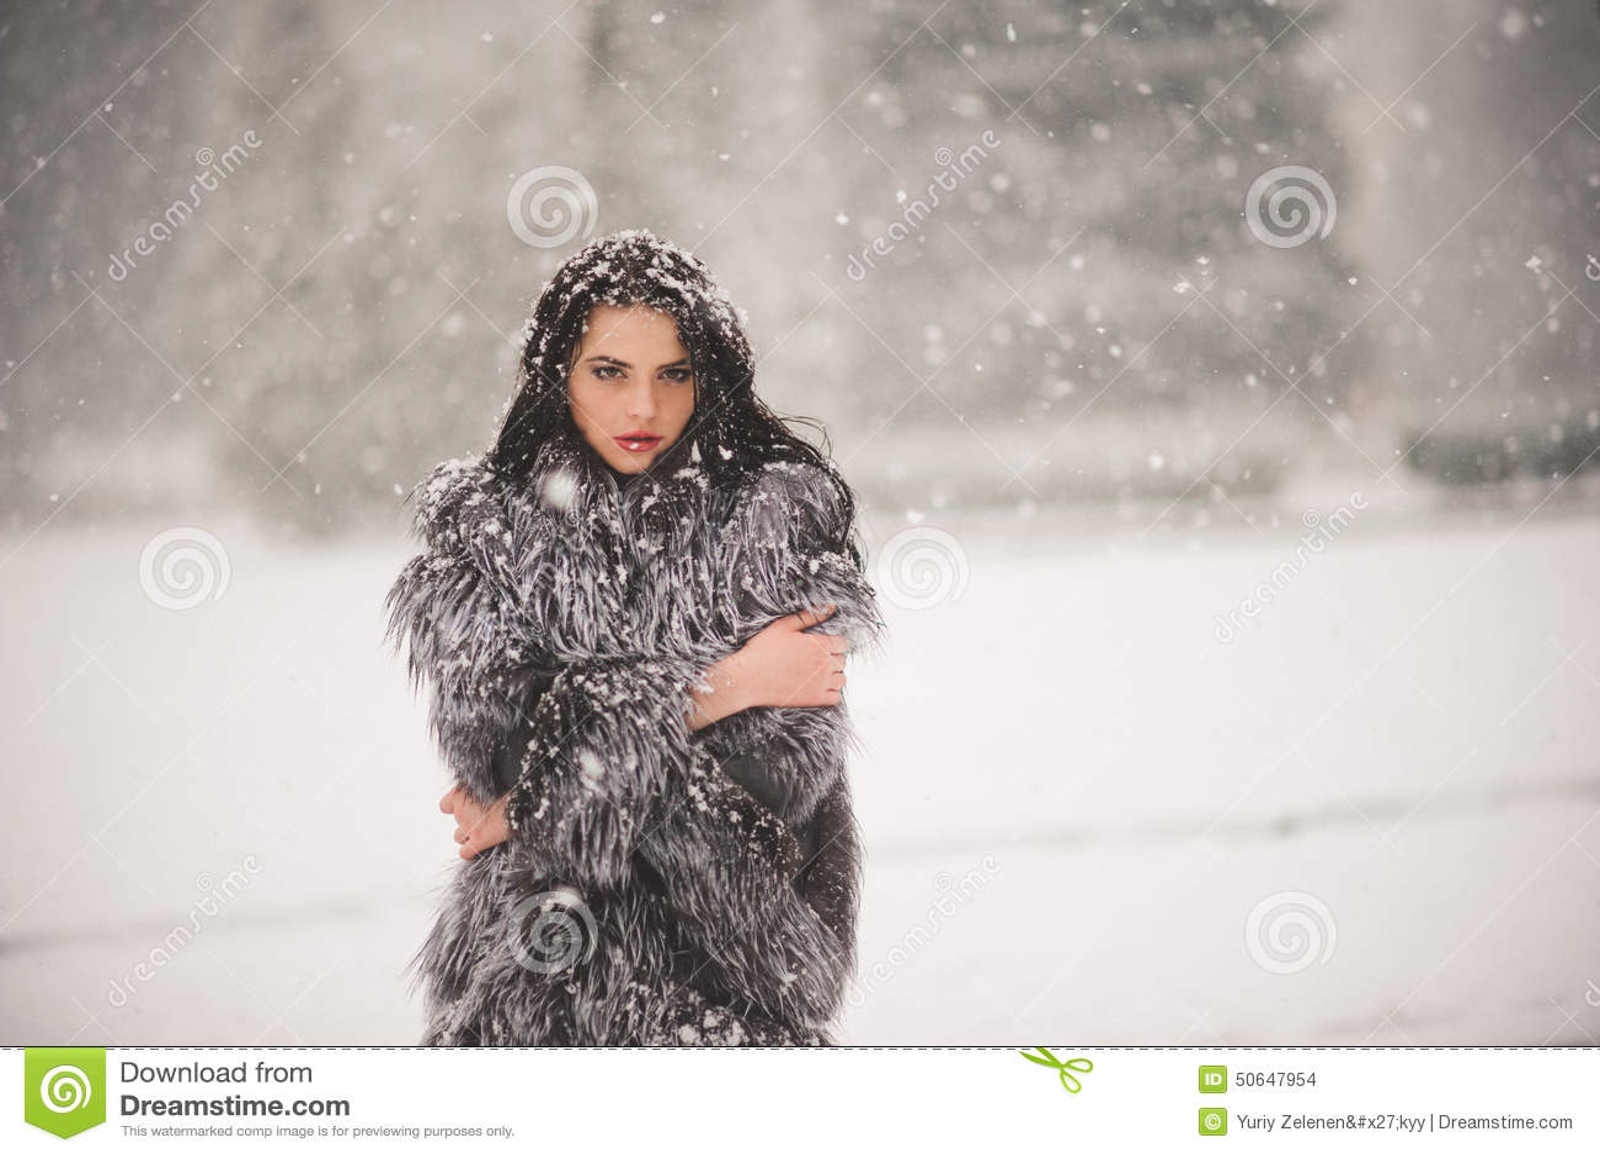 Картинки девушки зимой снег